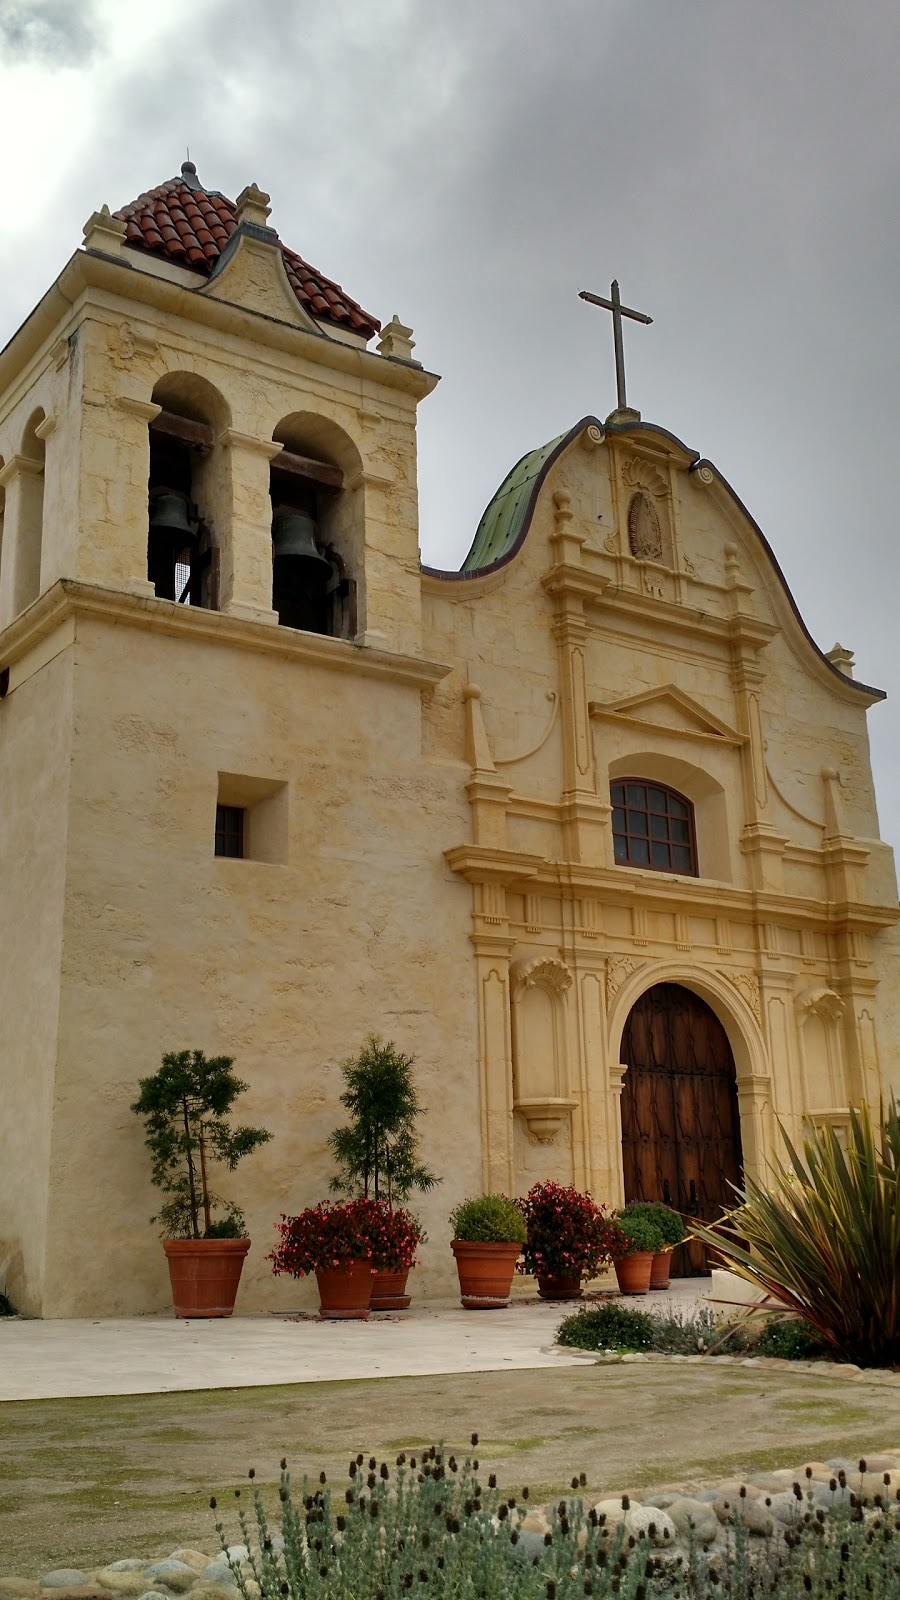 Reasons to visit Monterey - San Carlos Cathedral